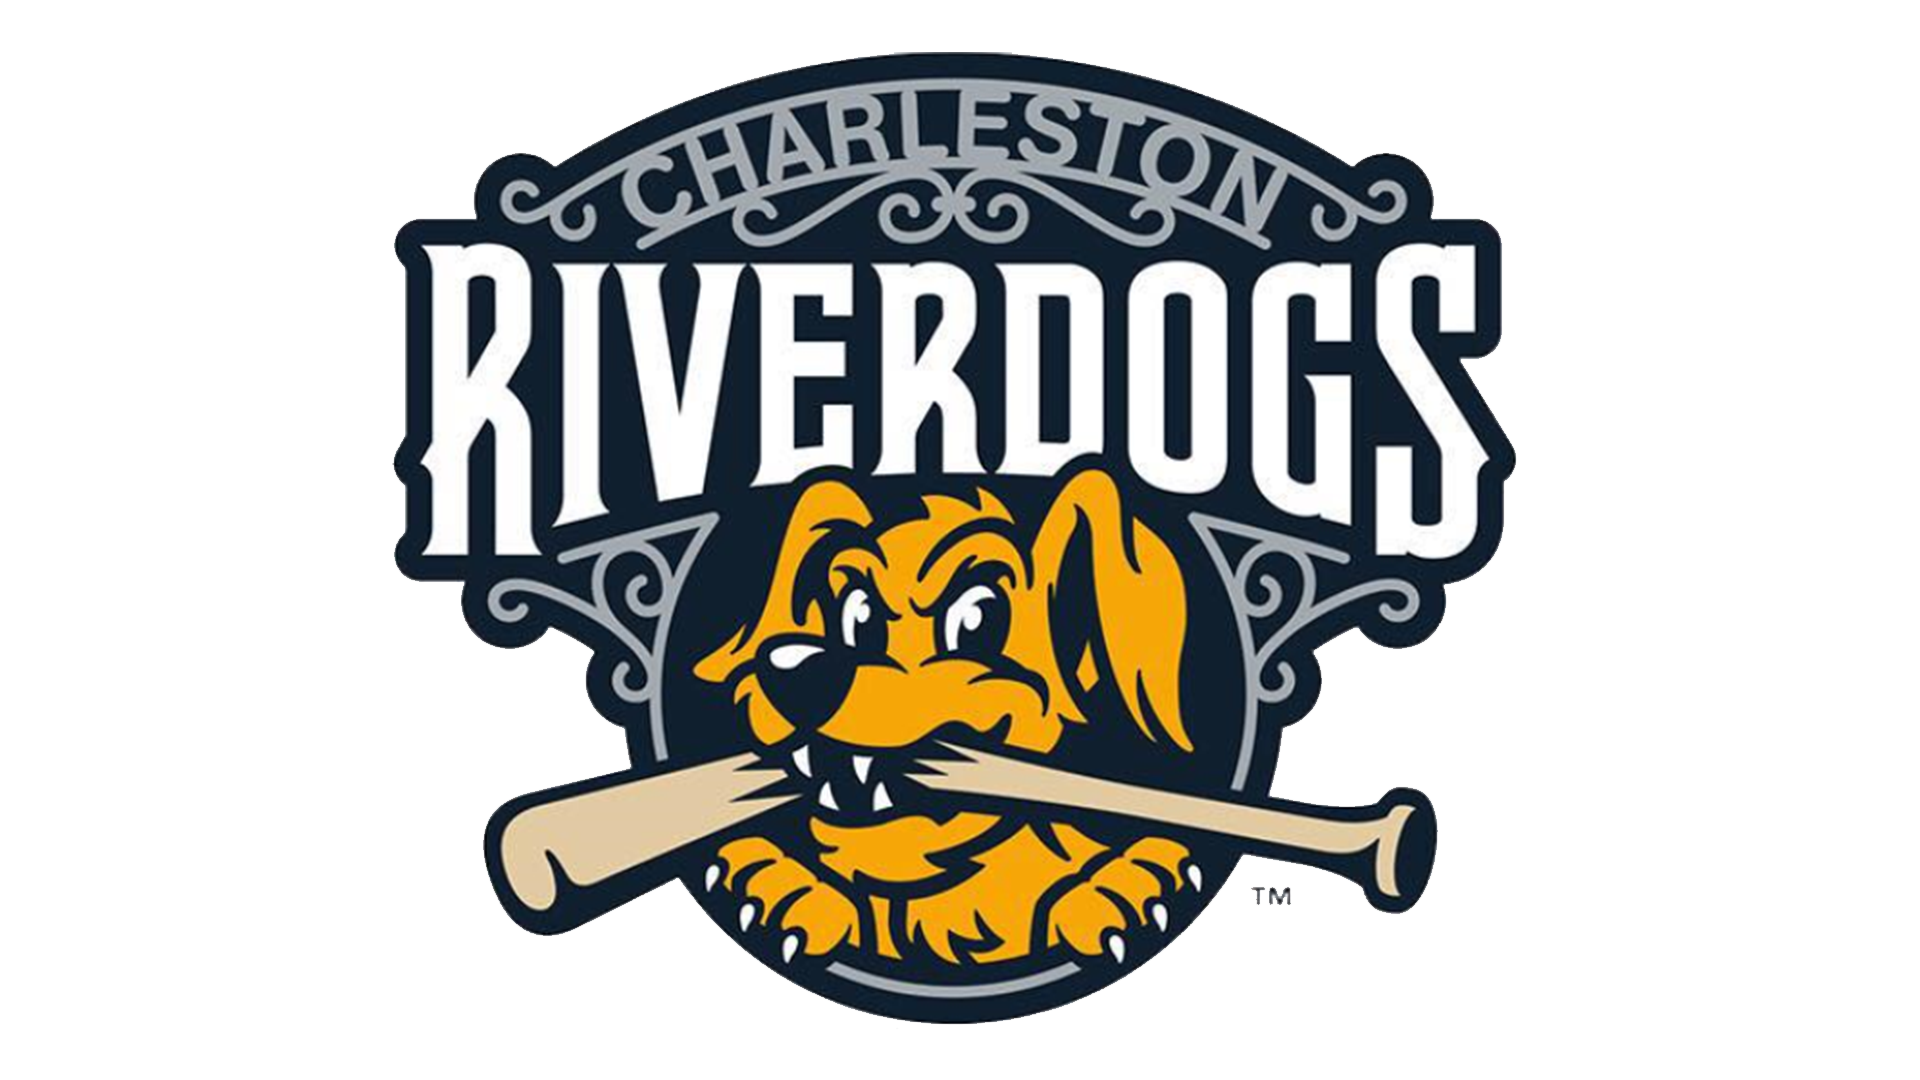 2019 HOSTING VENUE SPONSOR: CHARLESTON RIVERDOGS